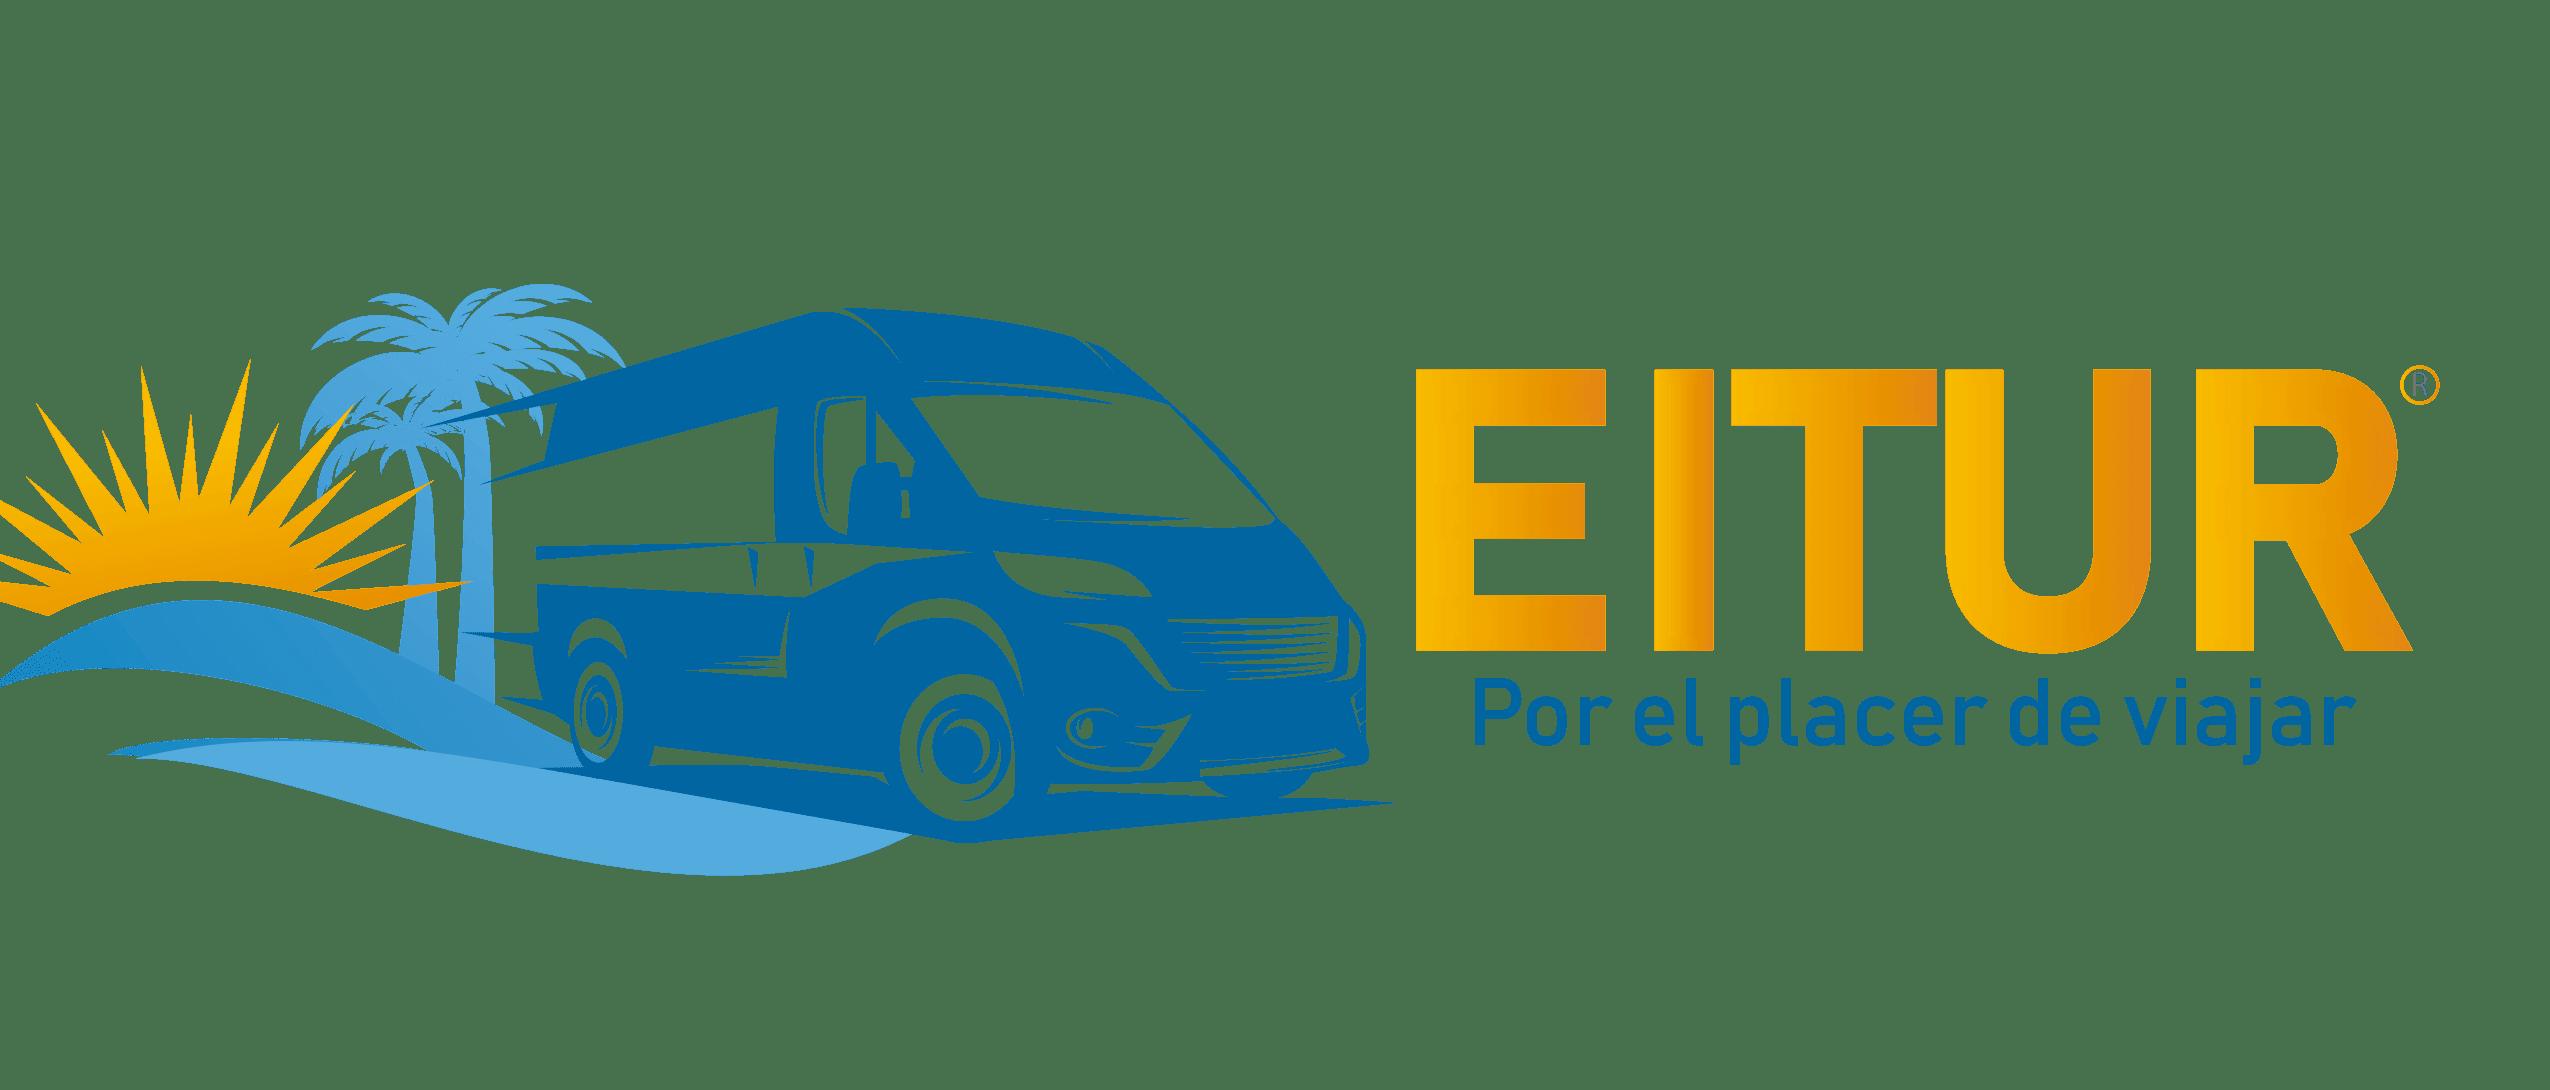 EITUR Transportadora Turistica & Travel